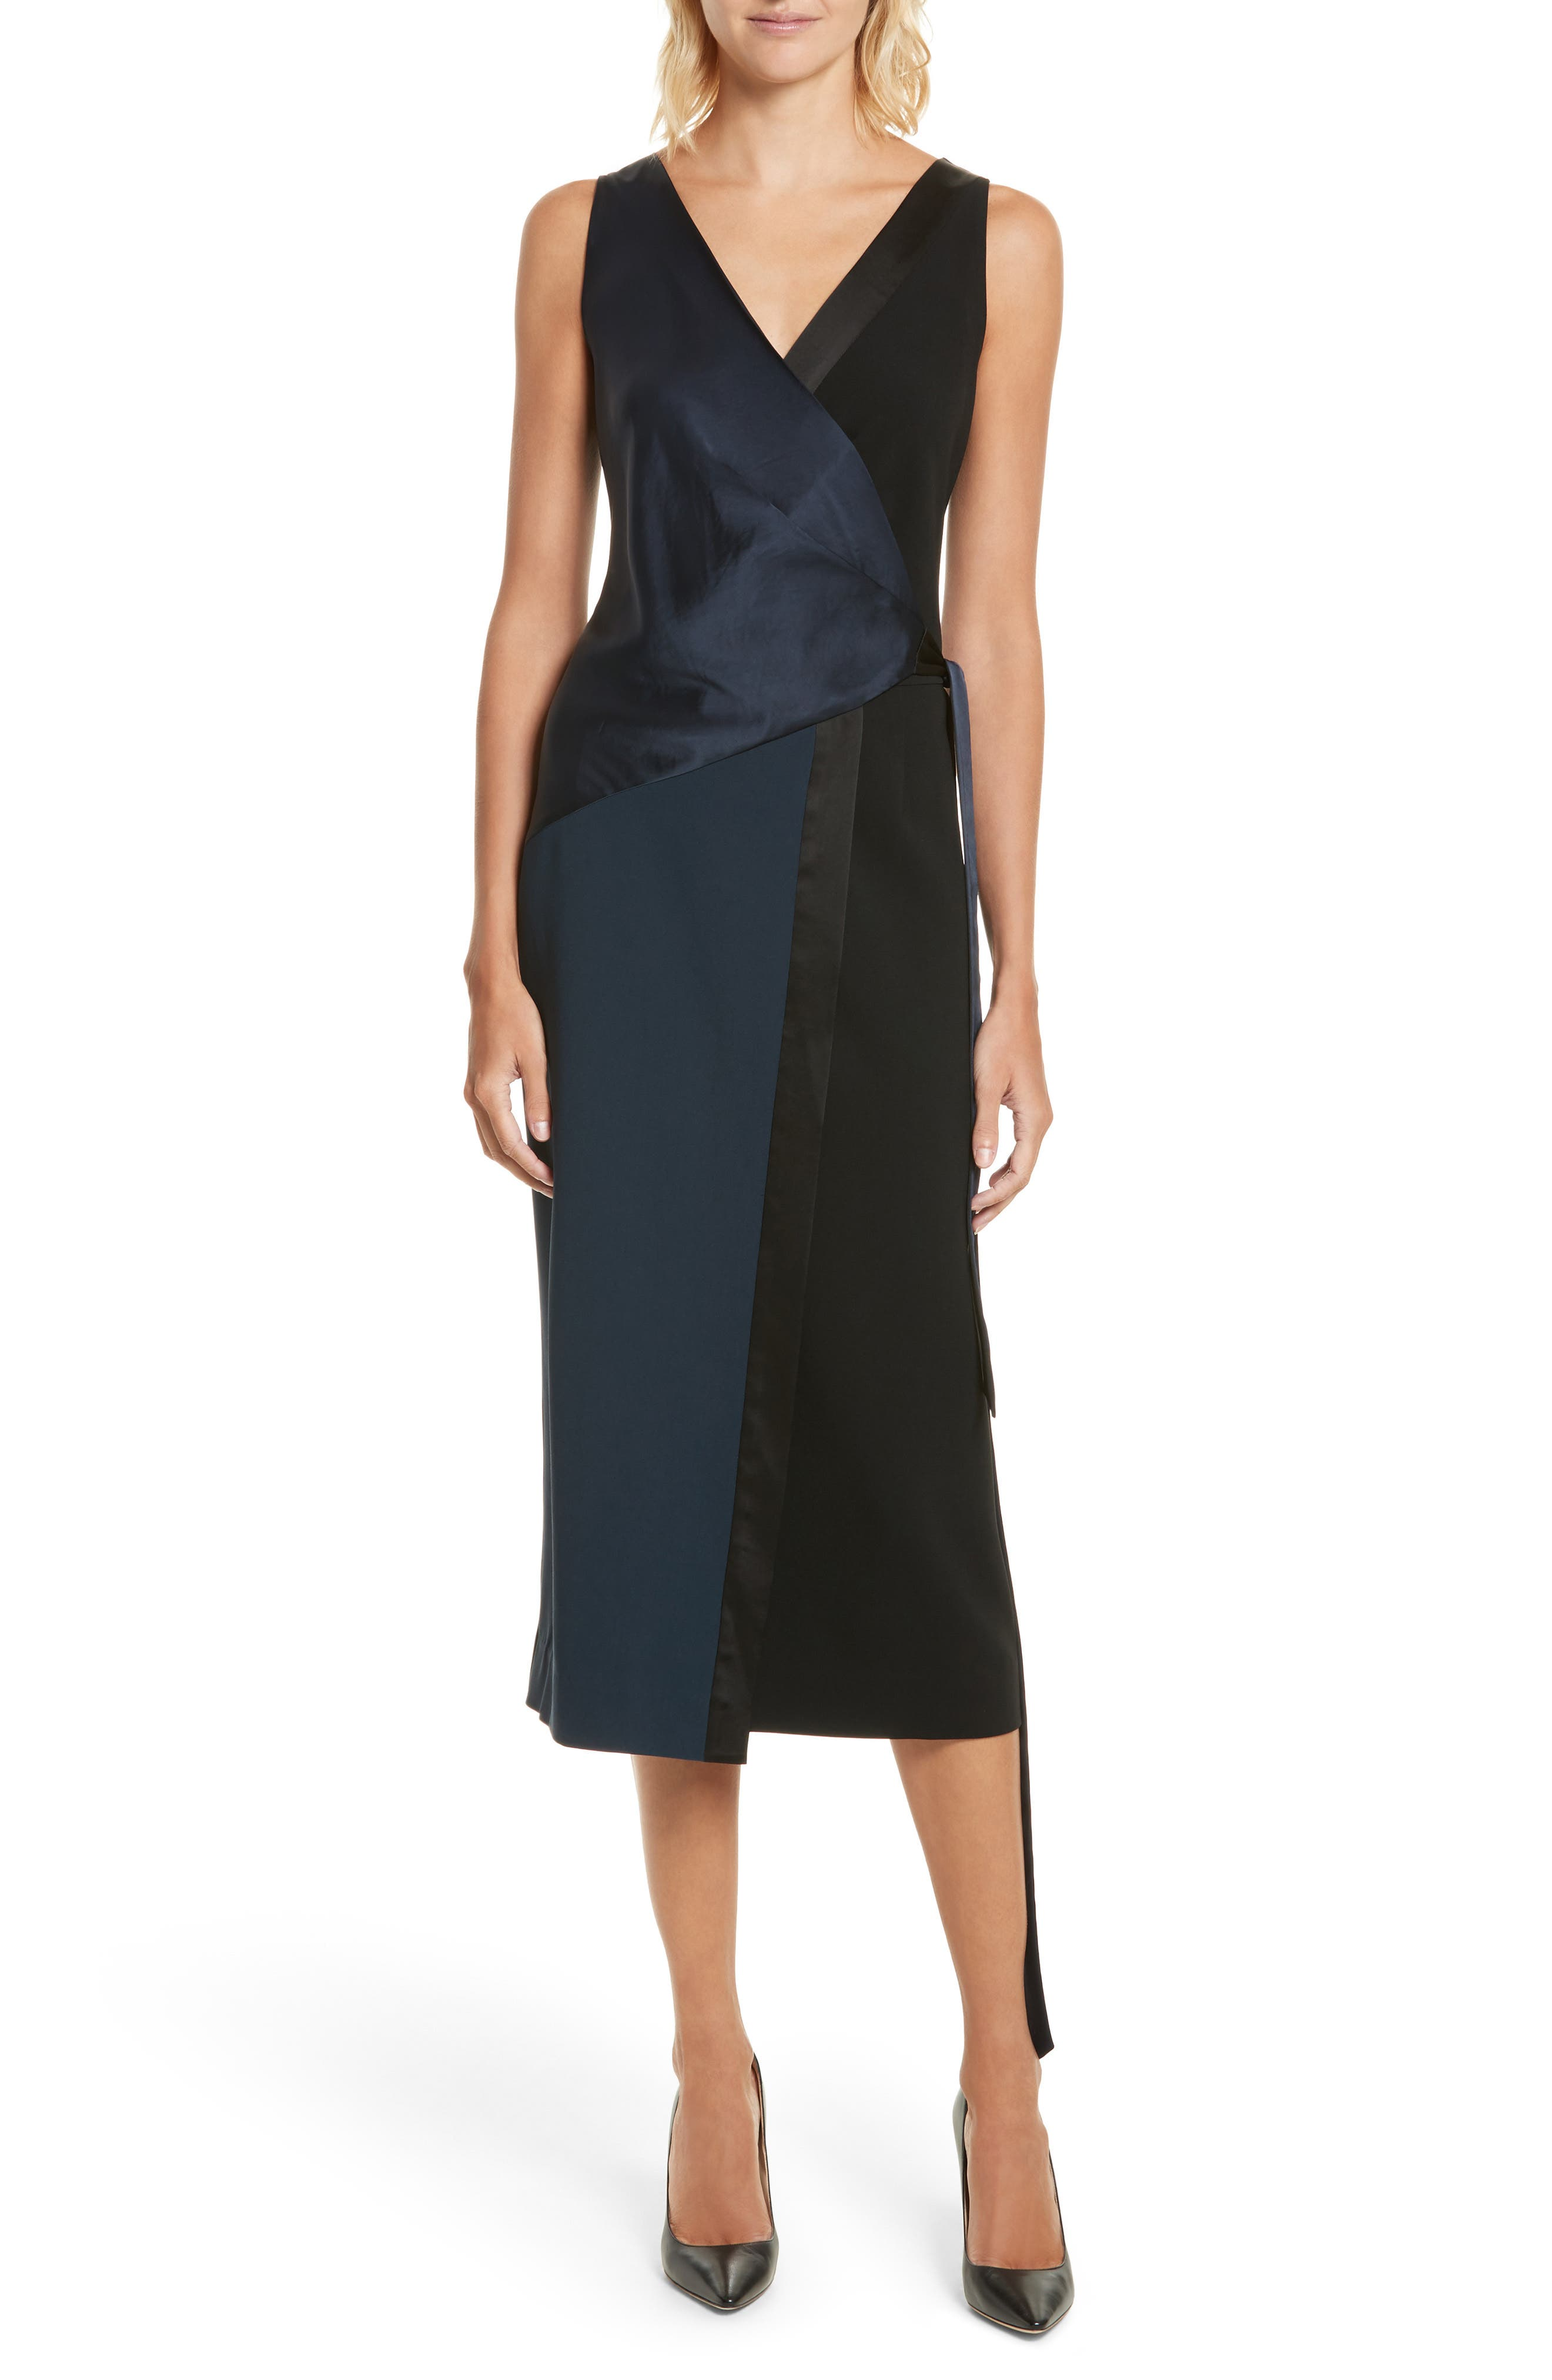 Midi Wrap Dress,                             Main thumbnail 1, color,                             Alexander Navy/ Black